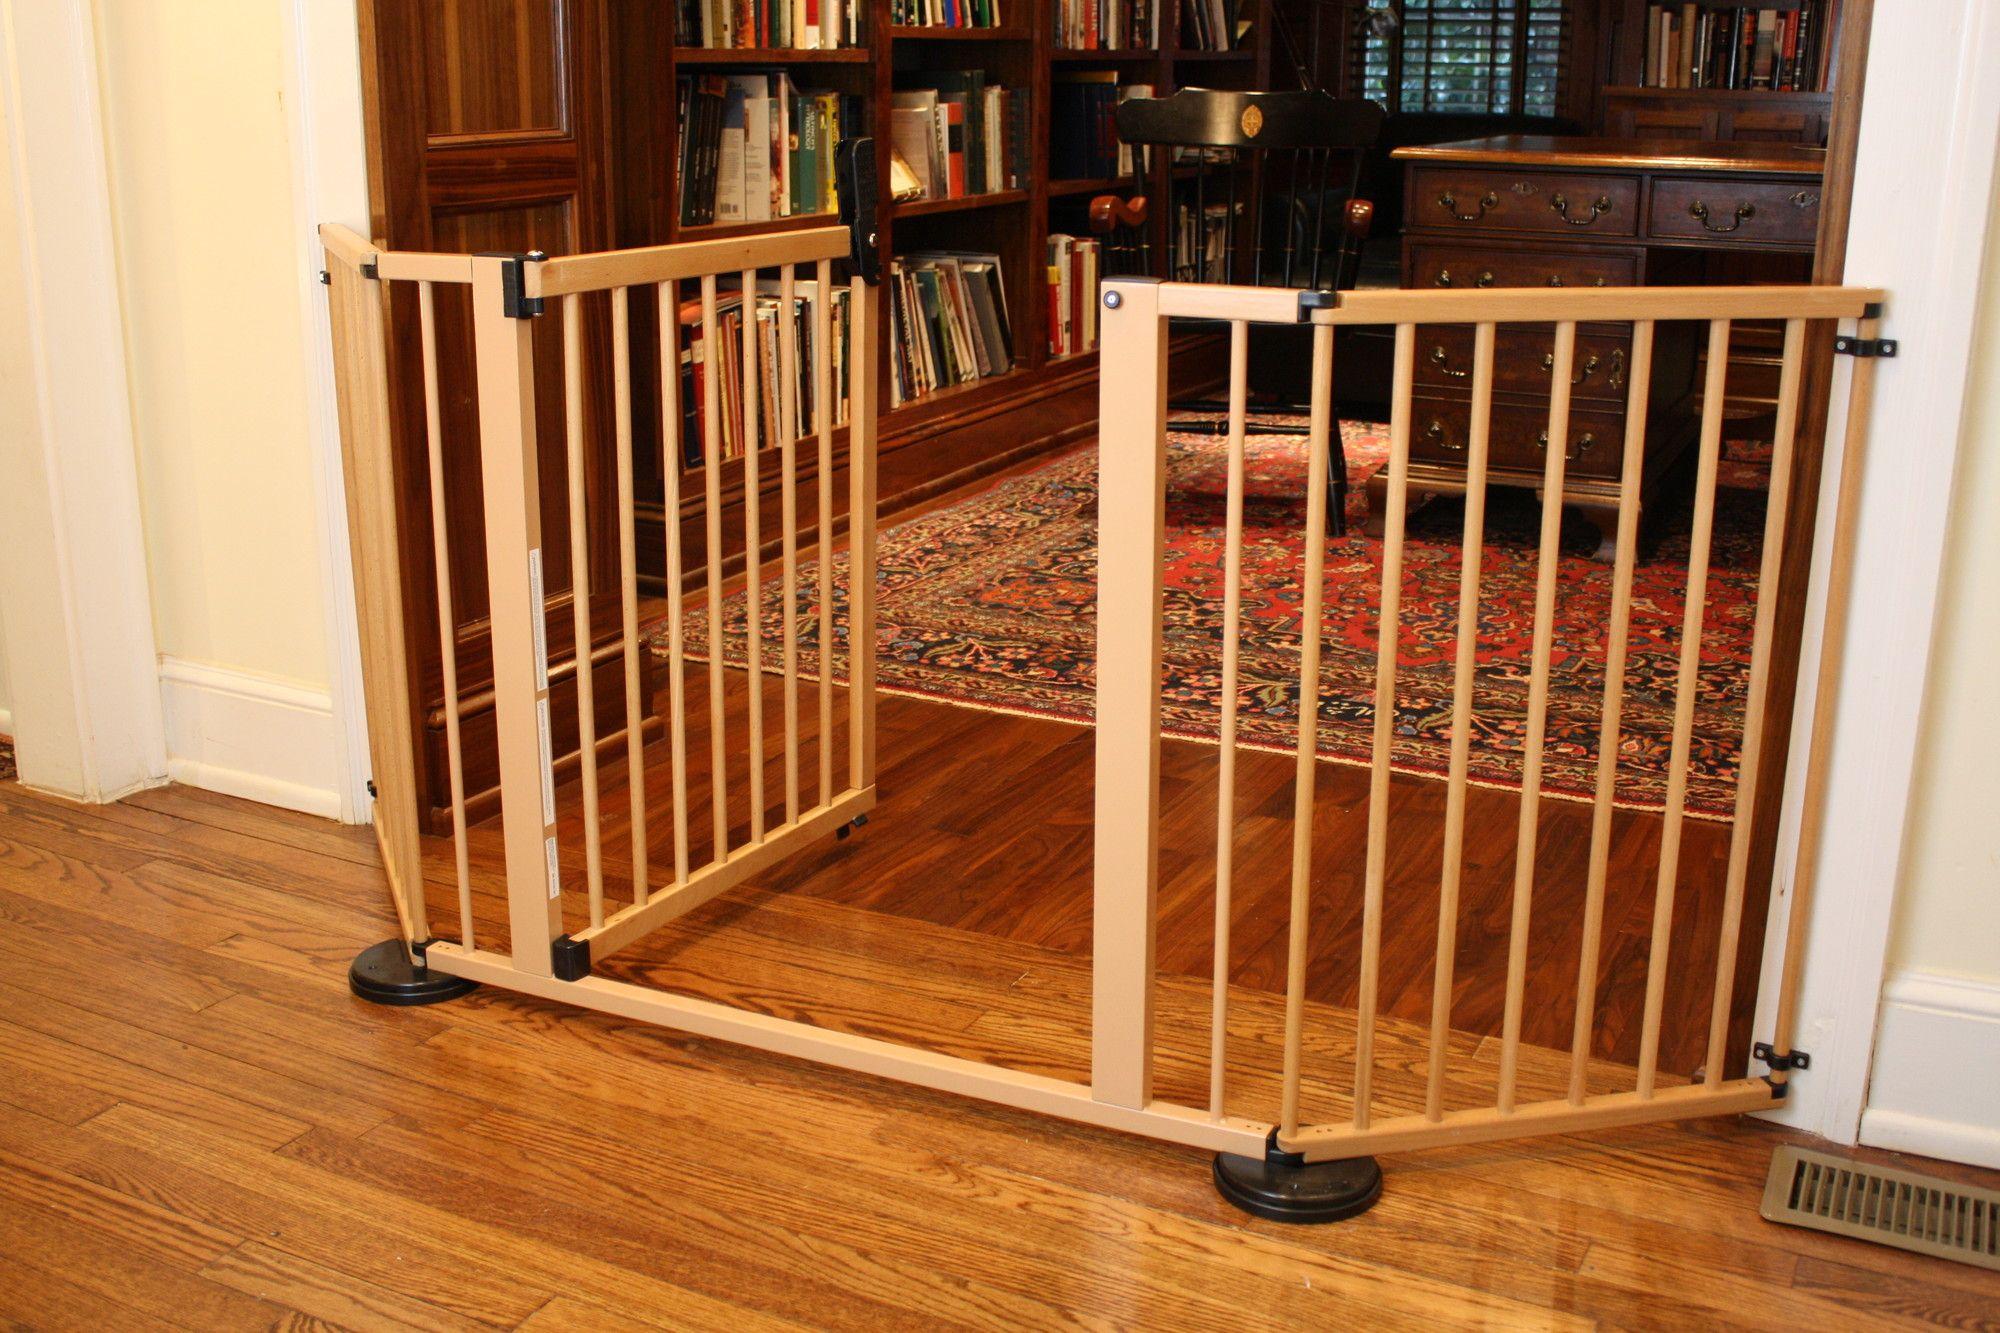 Versa Gate Baby gates, Baby safety gate, Baby proofing